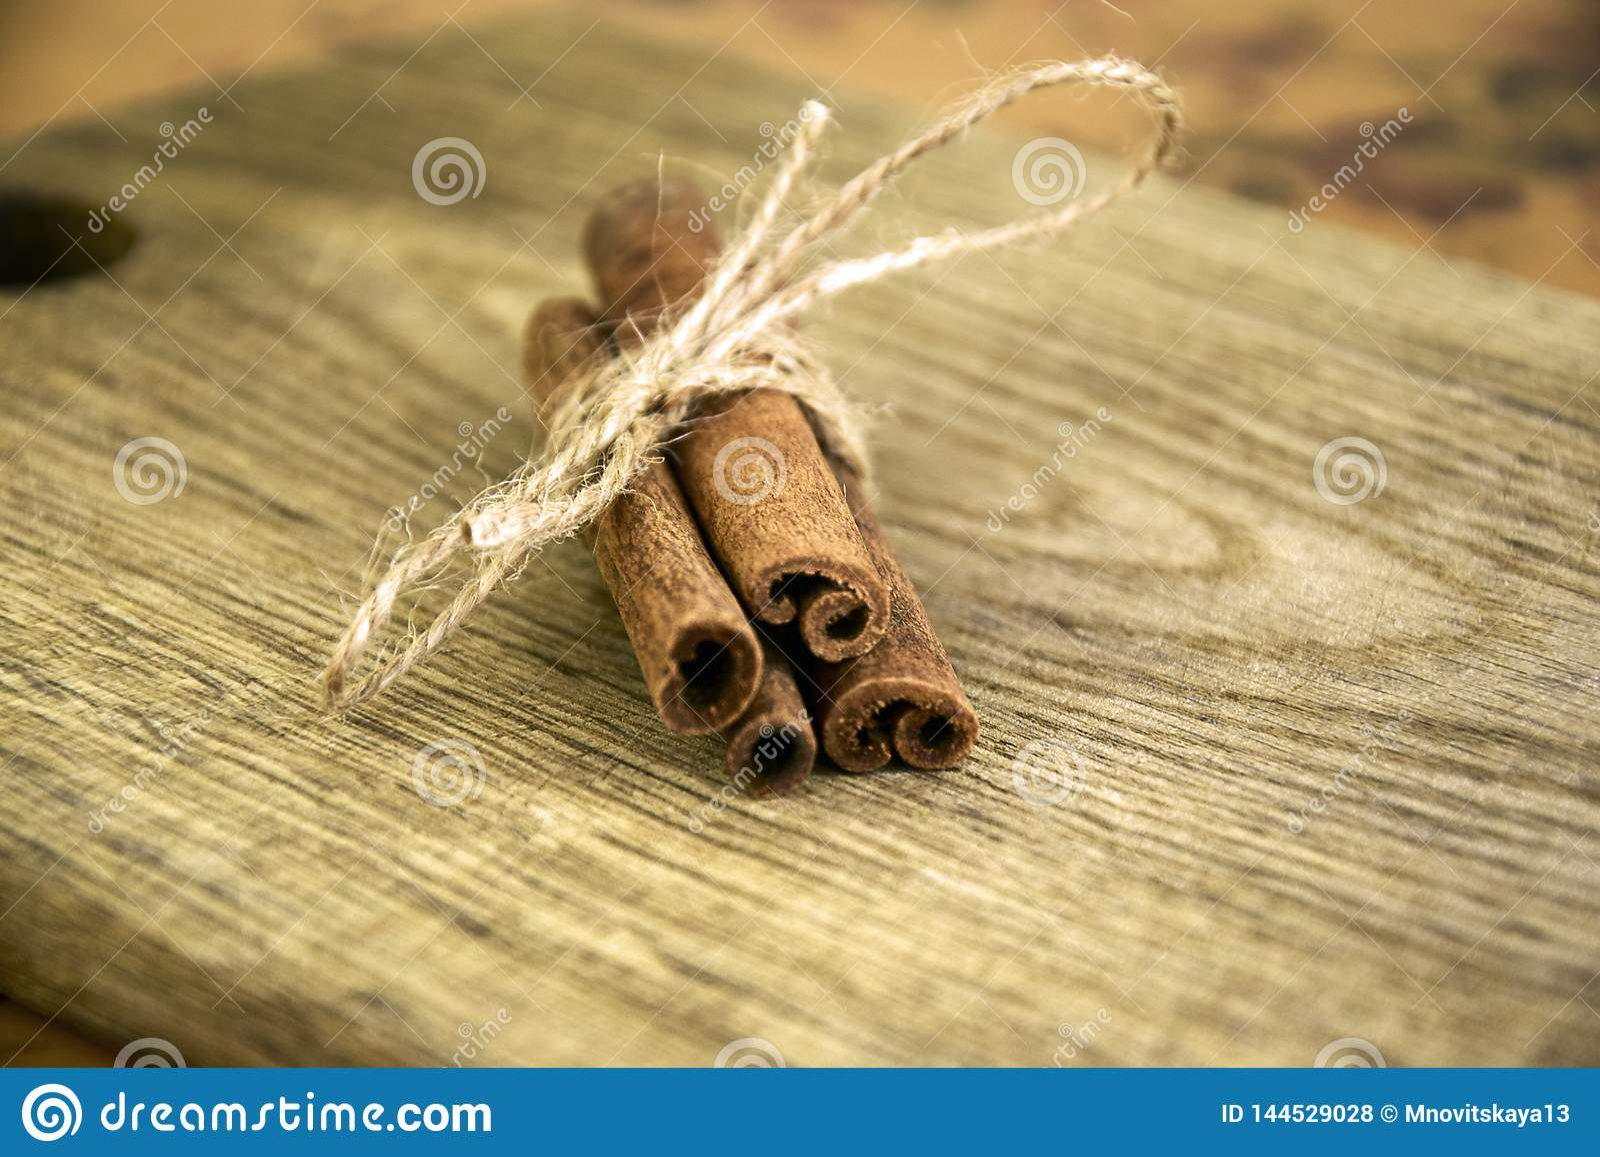 Pijpjes kaneel op oude houten raad